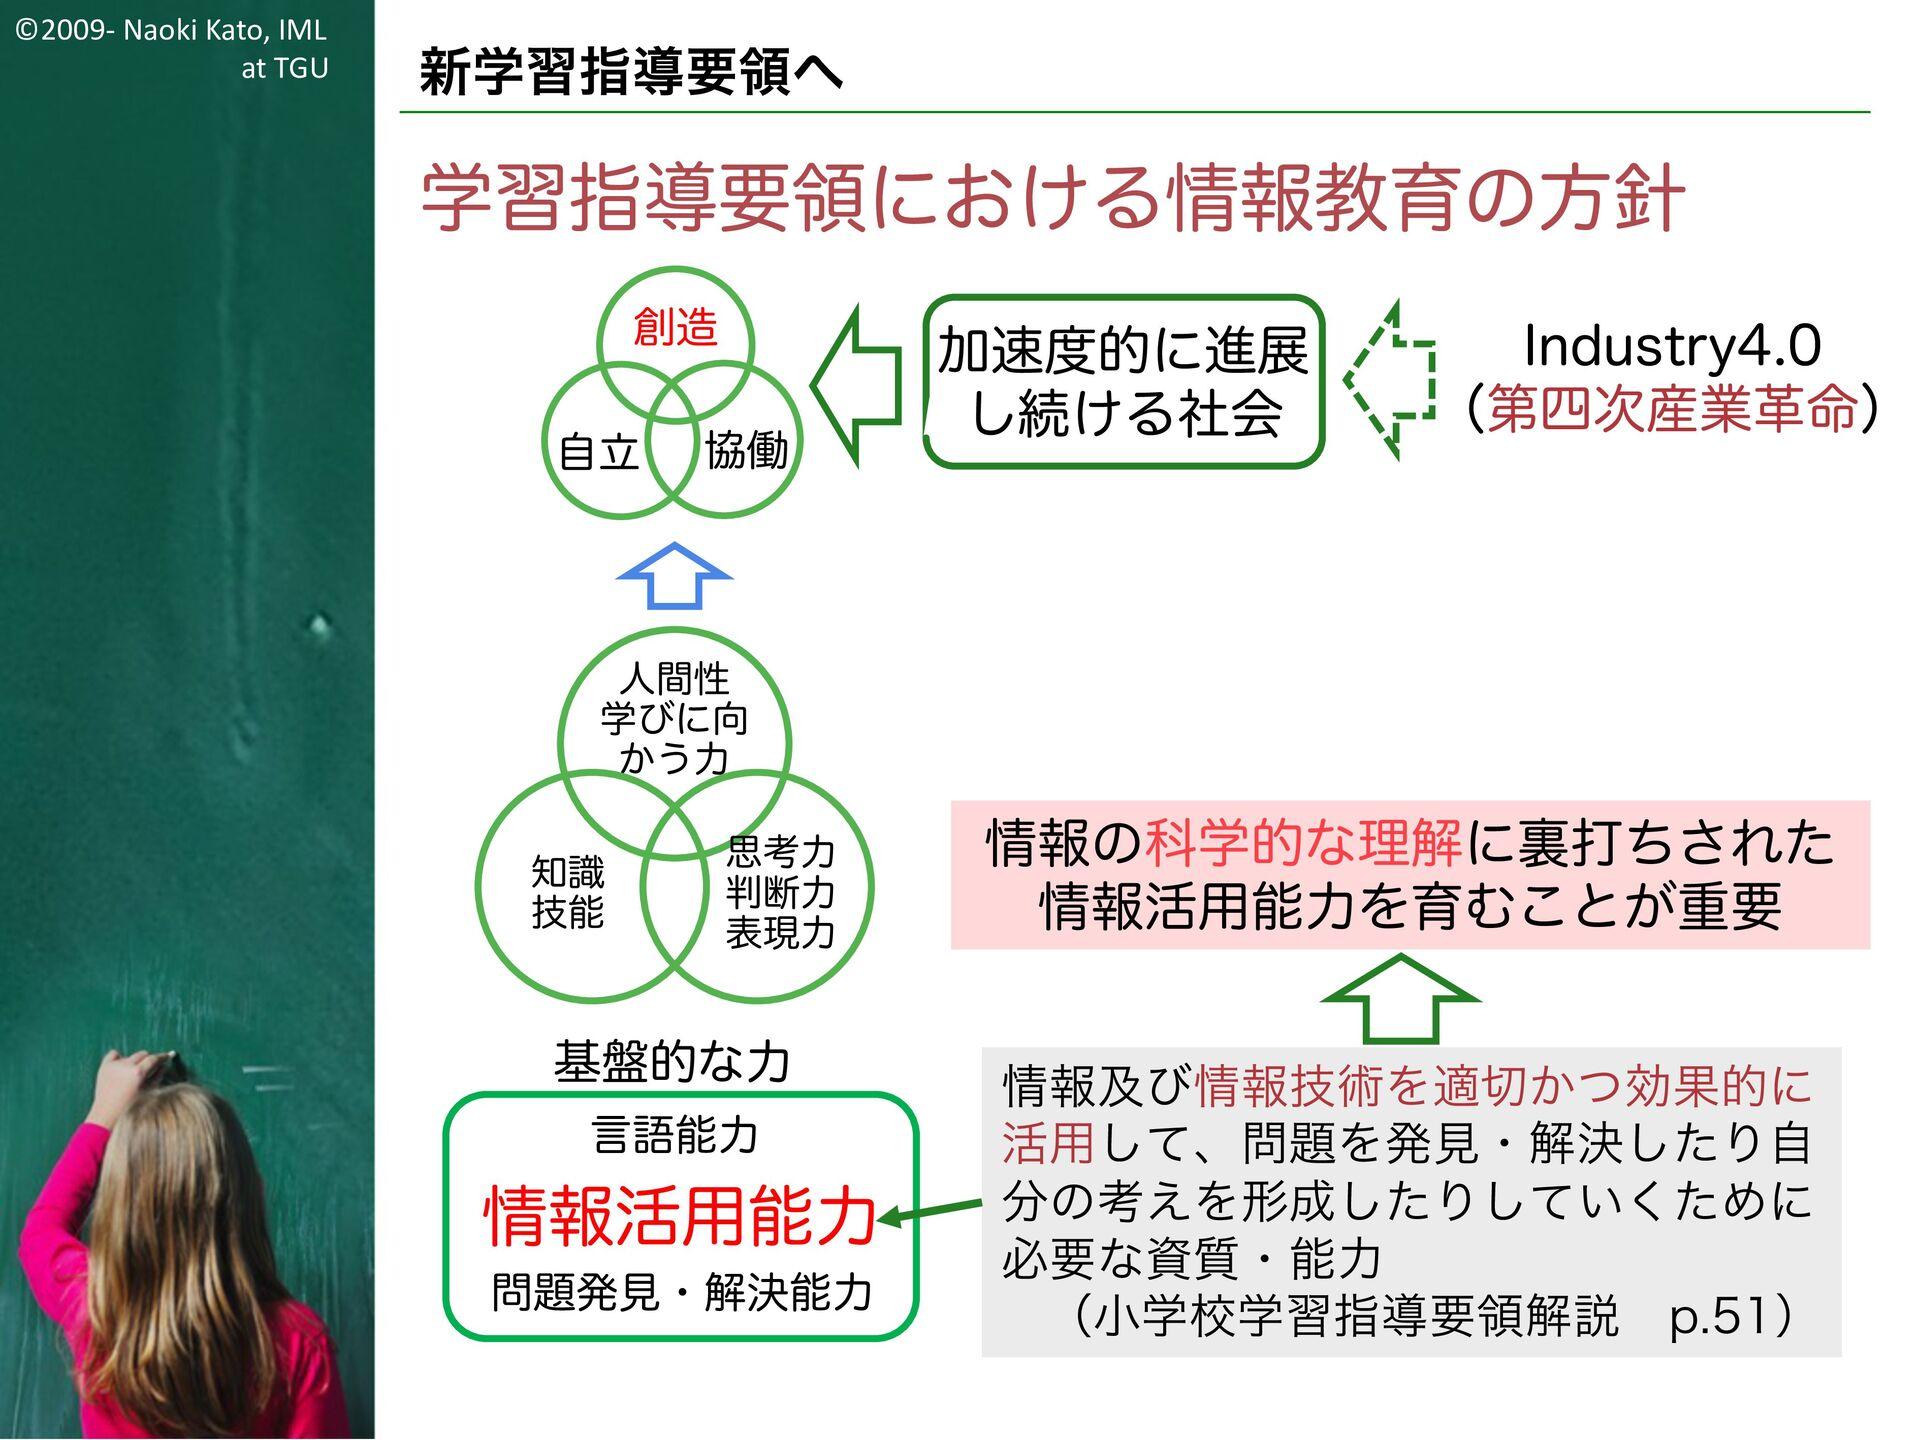 ©2009- Naoki Kato, IML at TGU 新学習指導要領へ 新学習指導要領で...